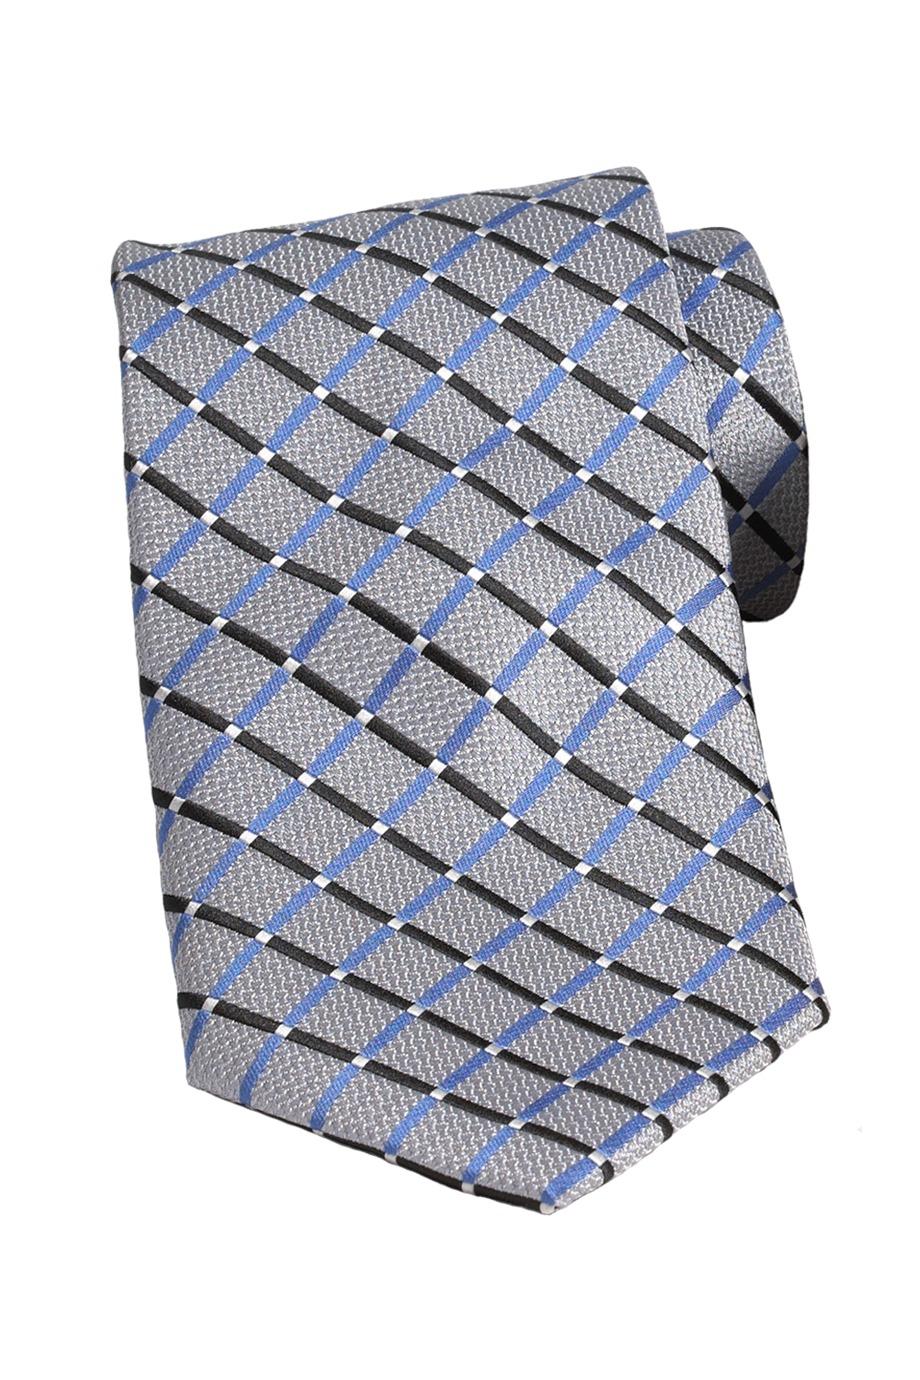 Edwards Garment CR00 - Crossroads Tie